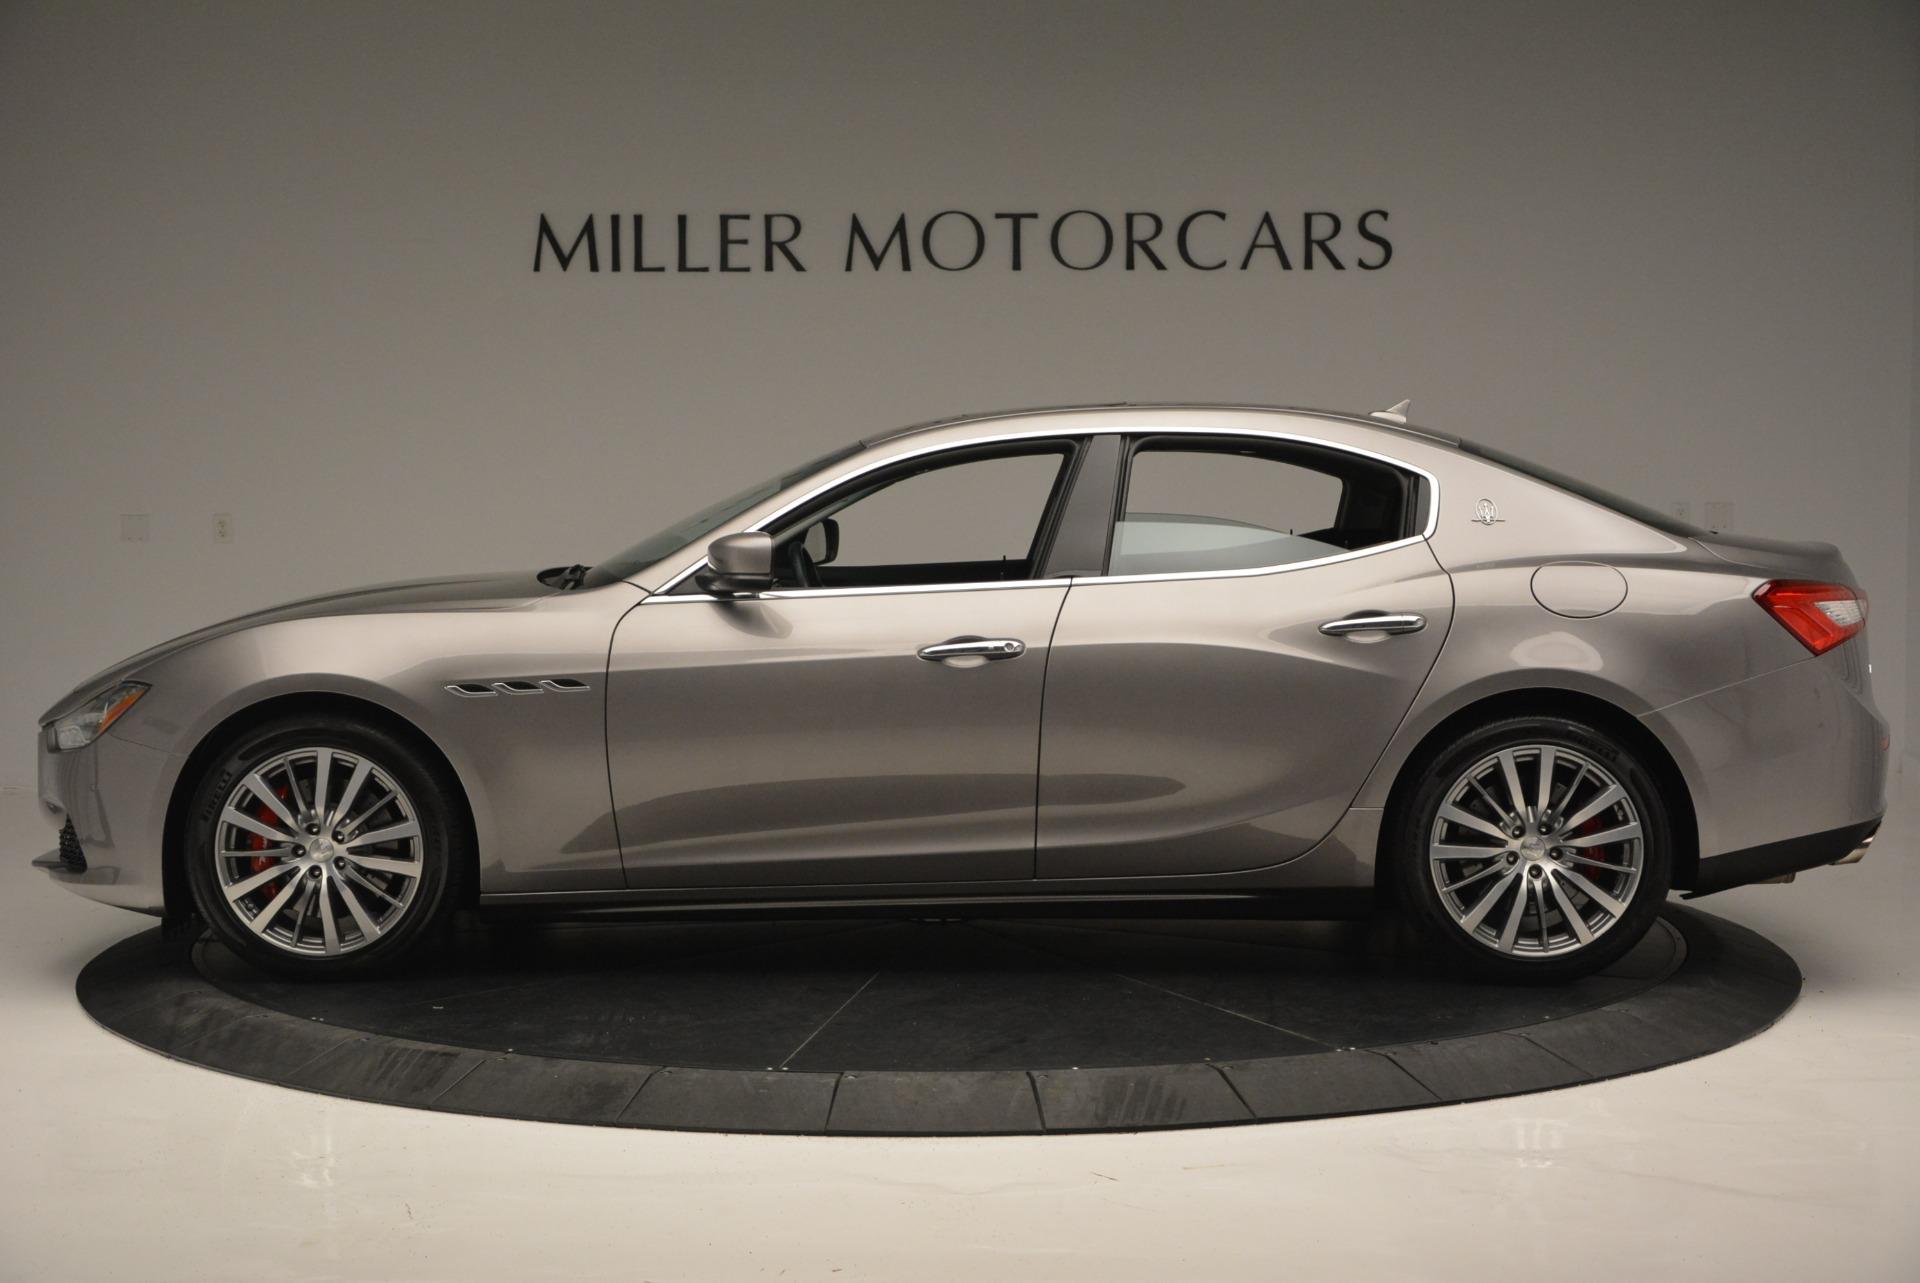 Used 2016 Maserati Ghibli S Q4  EX- LOANER For Sale In Westport, CT 668_p3